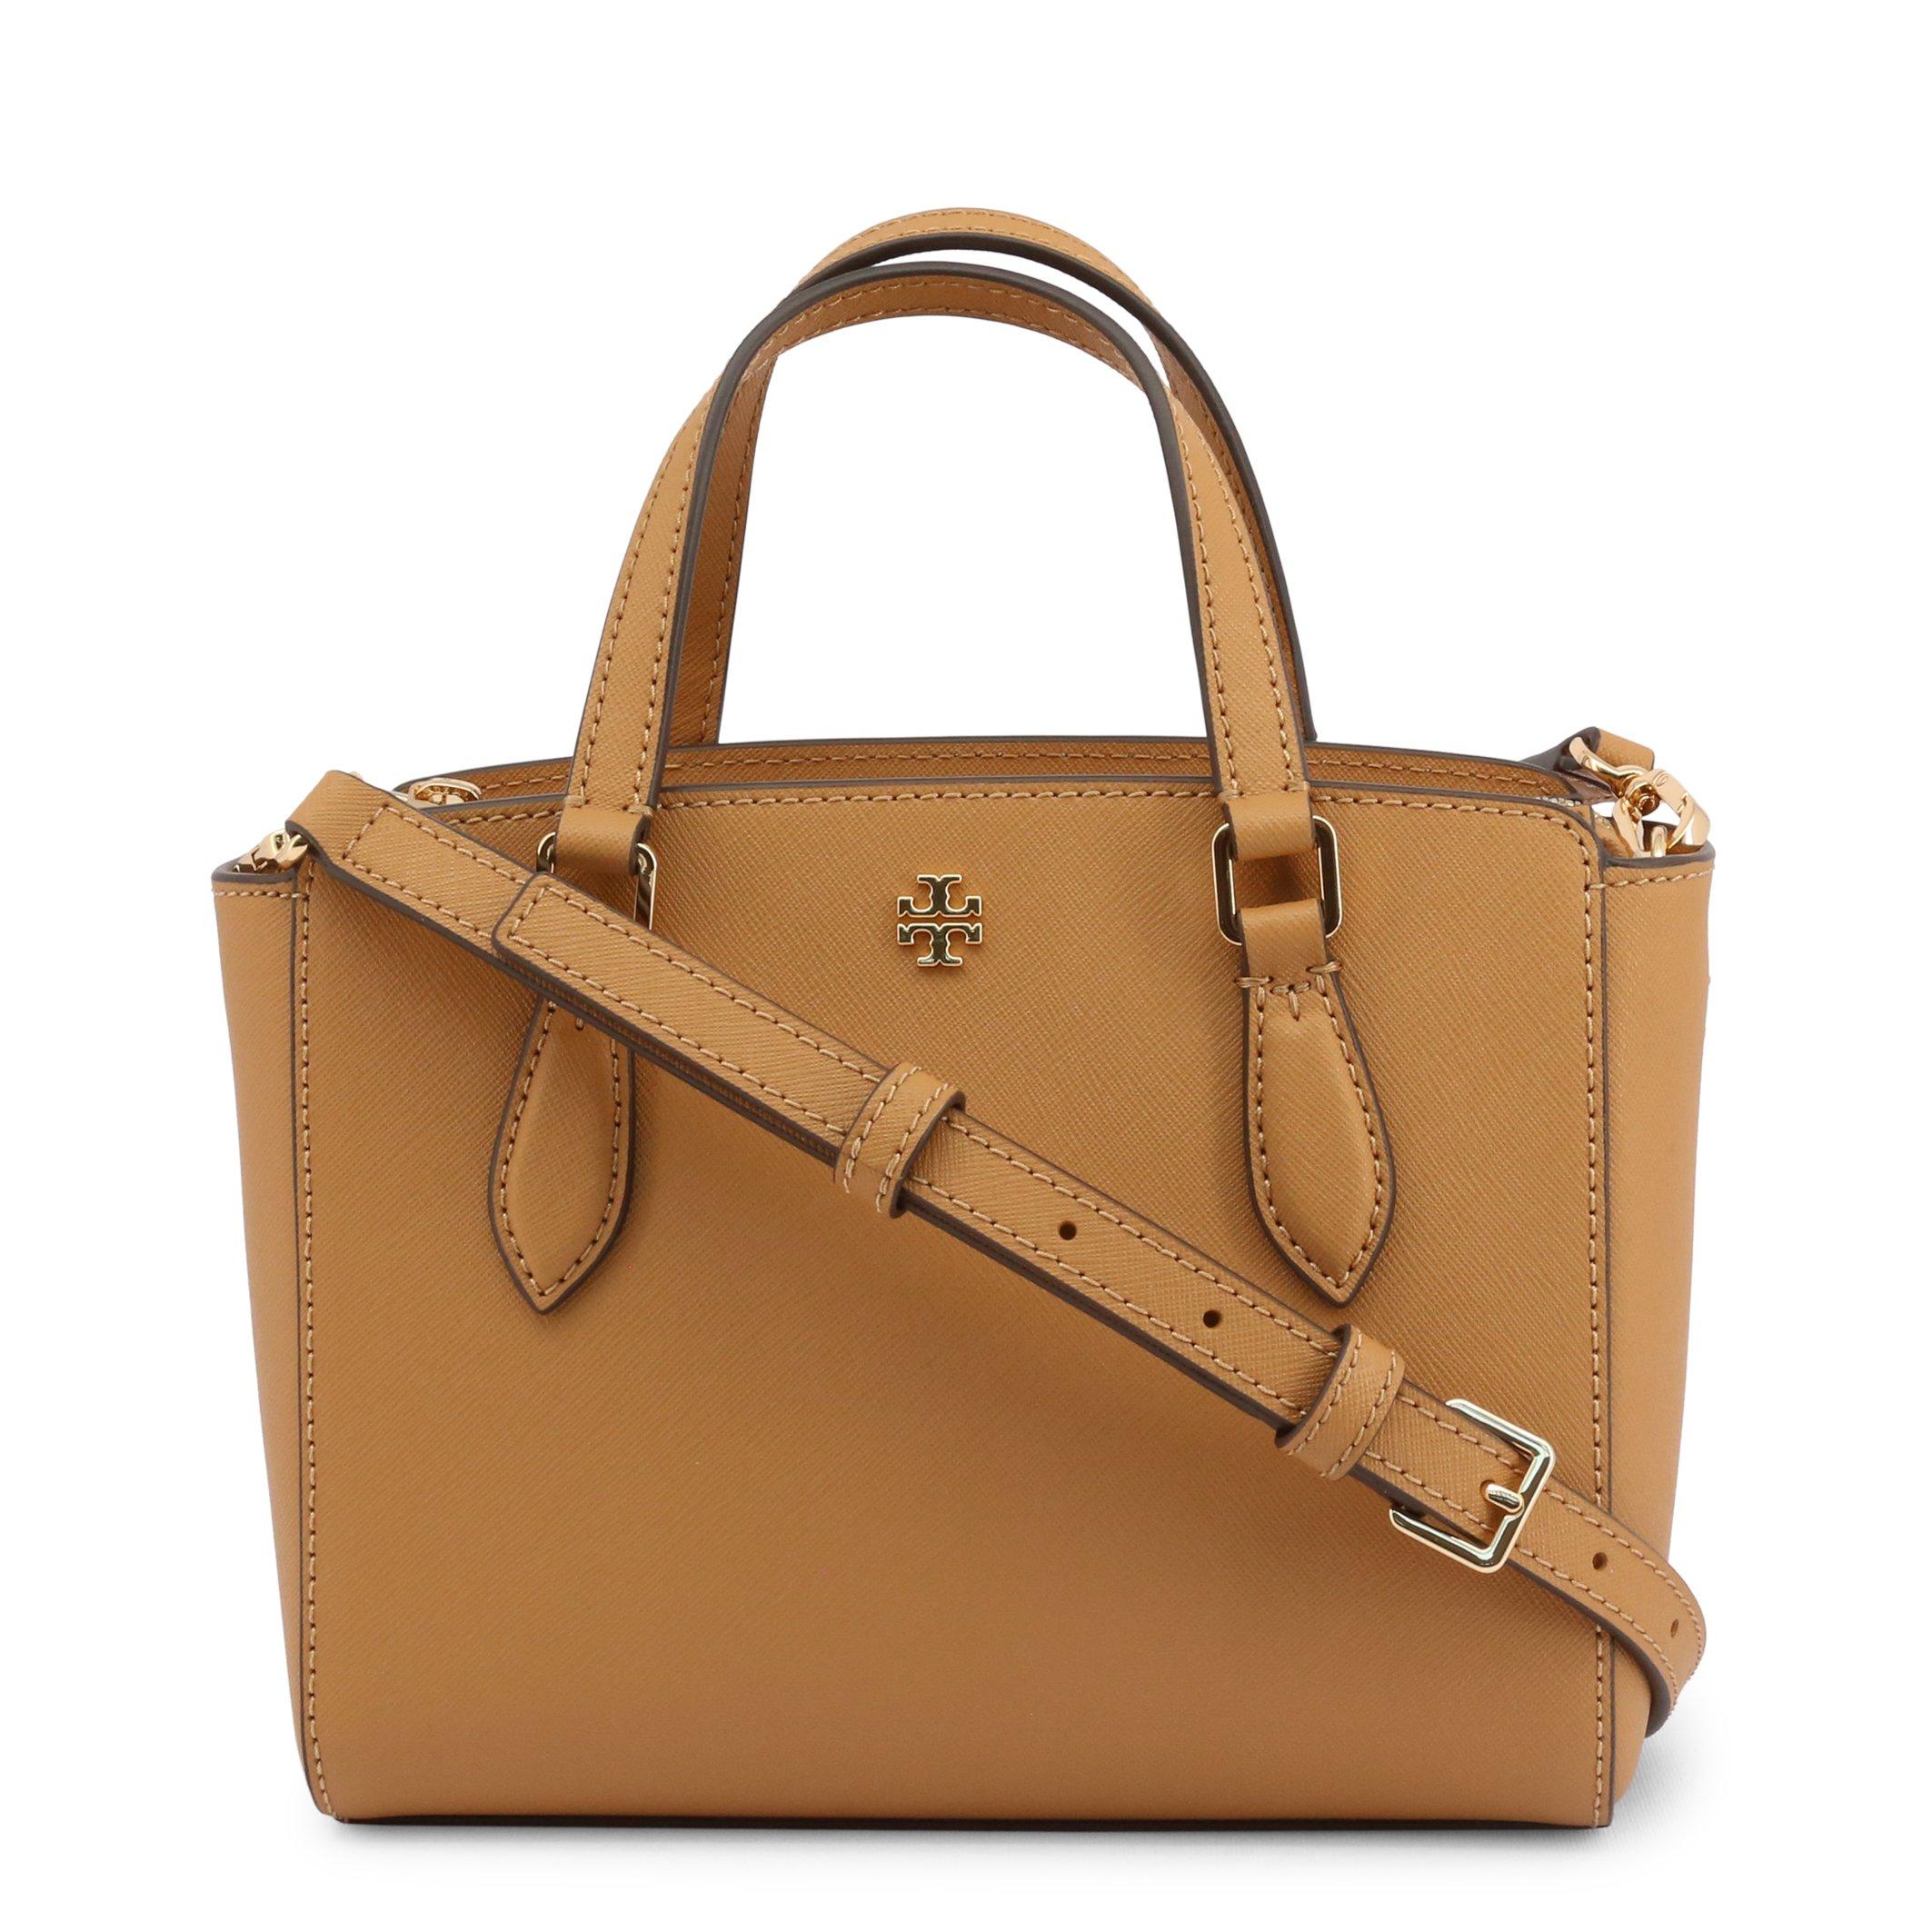 Tory Burch Women's Handbag Various Colours 64189 - brown NOSIZE